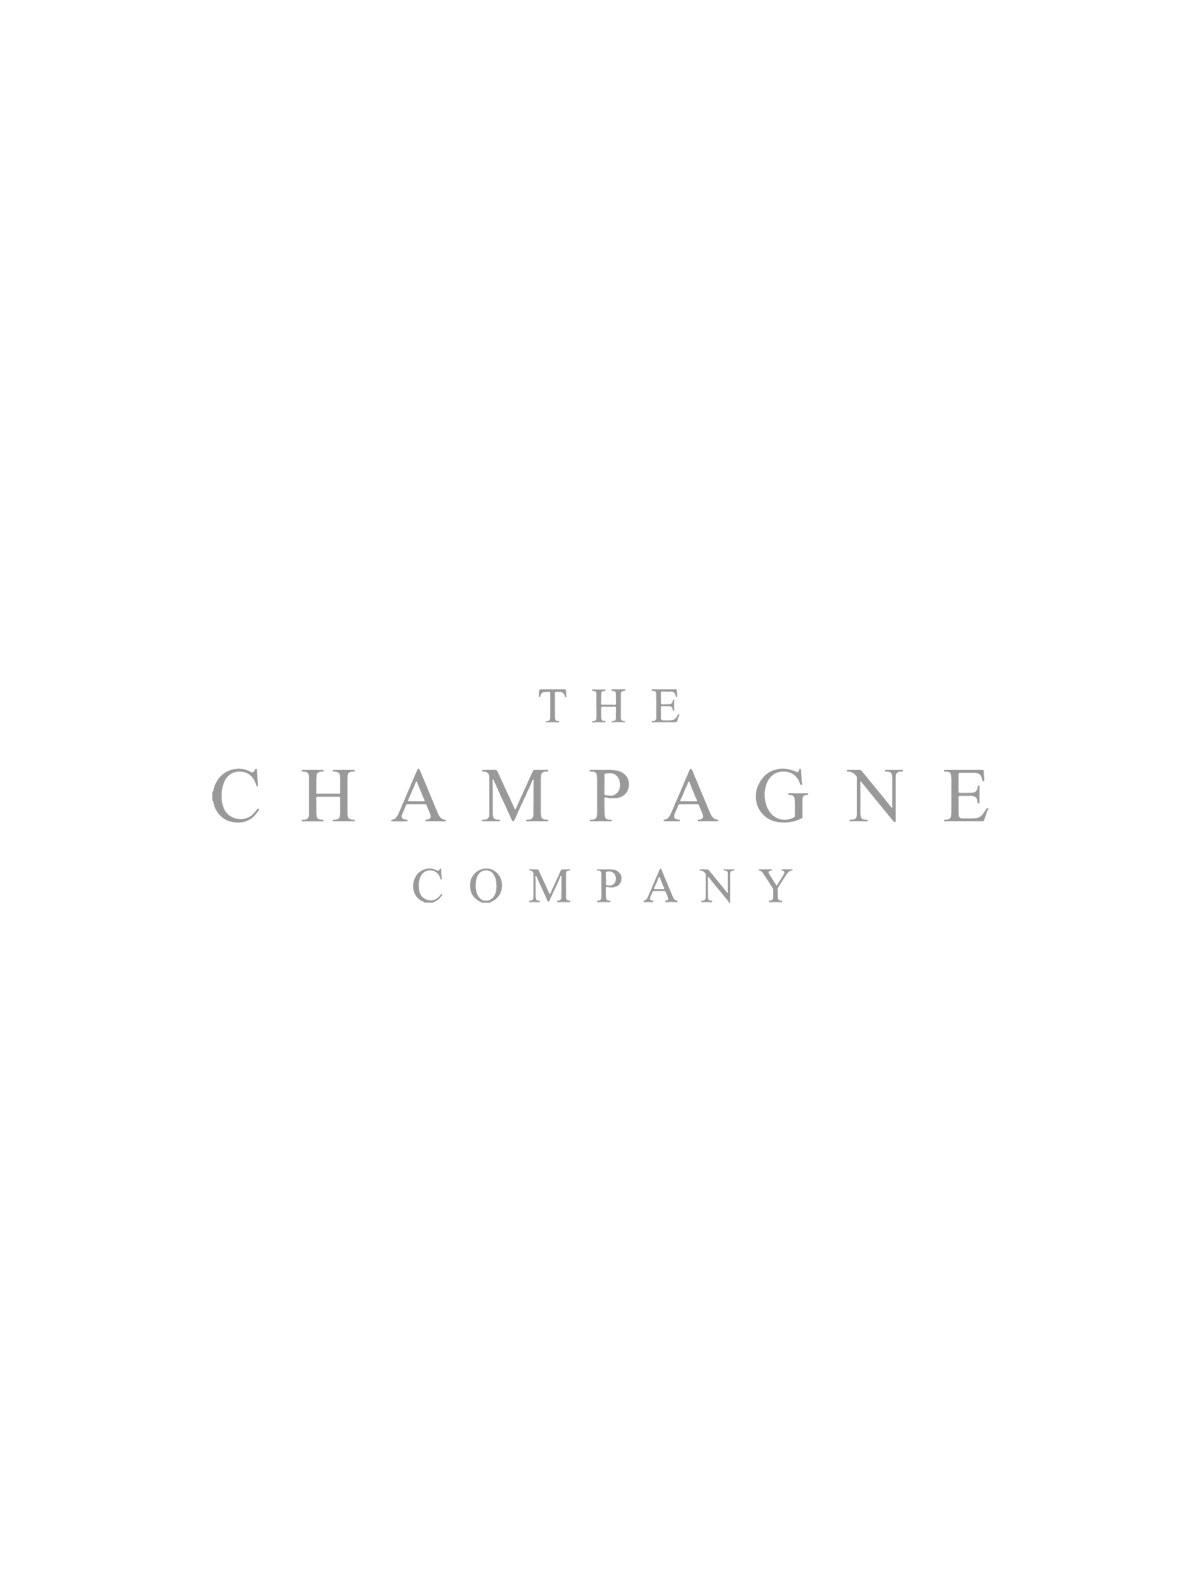 Ornellaia Le Serre Nuove 2018 Wine Tuscany Italy 70cl